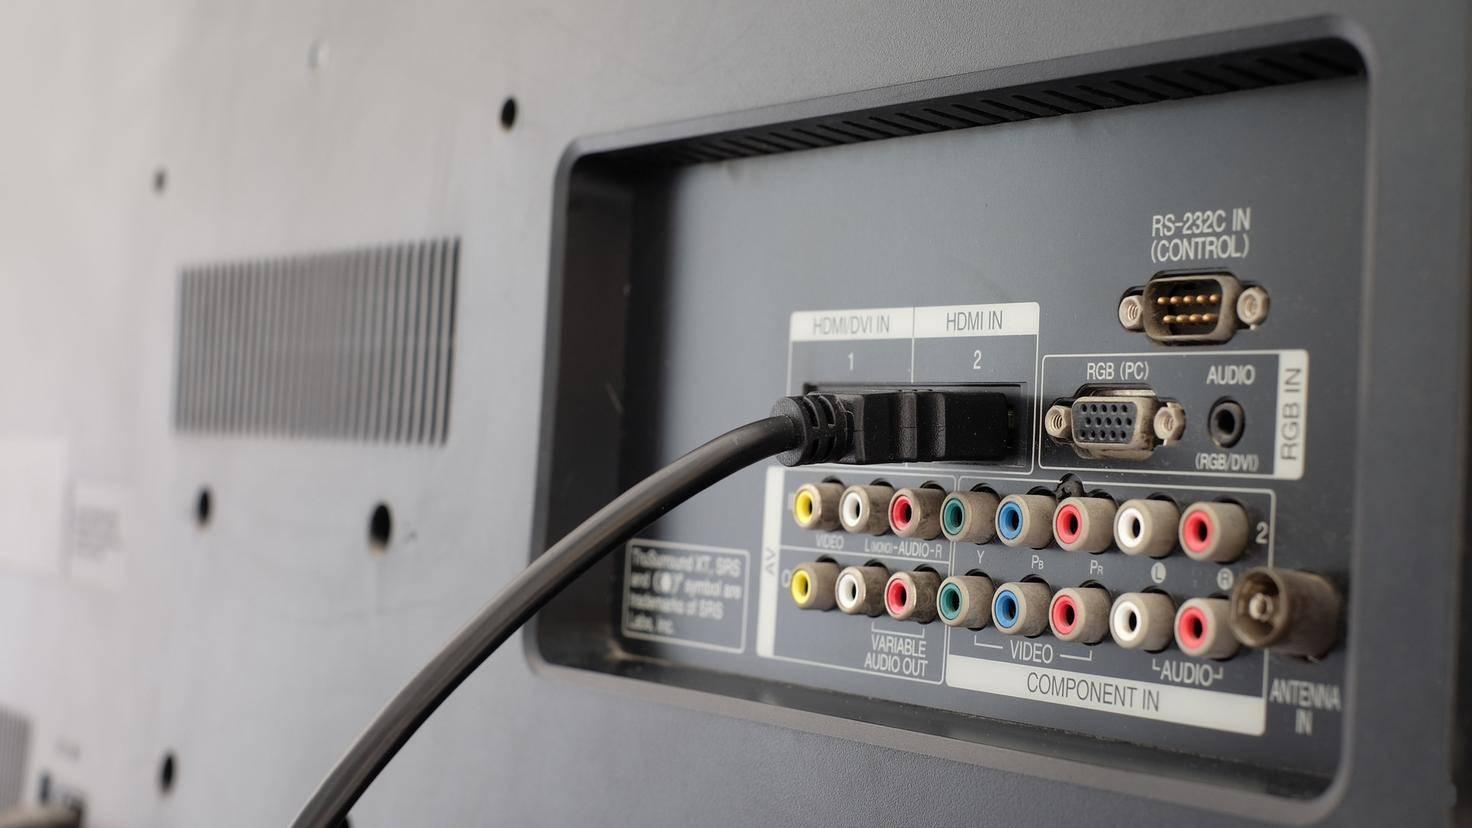 HDMI line many slot back TV